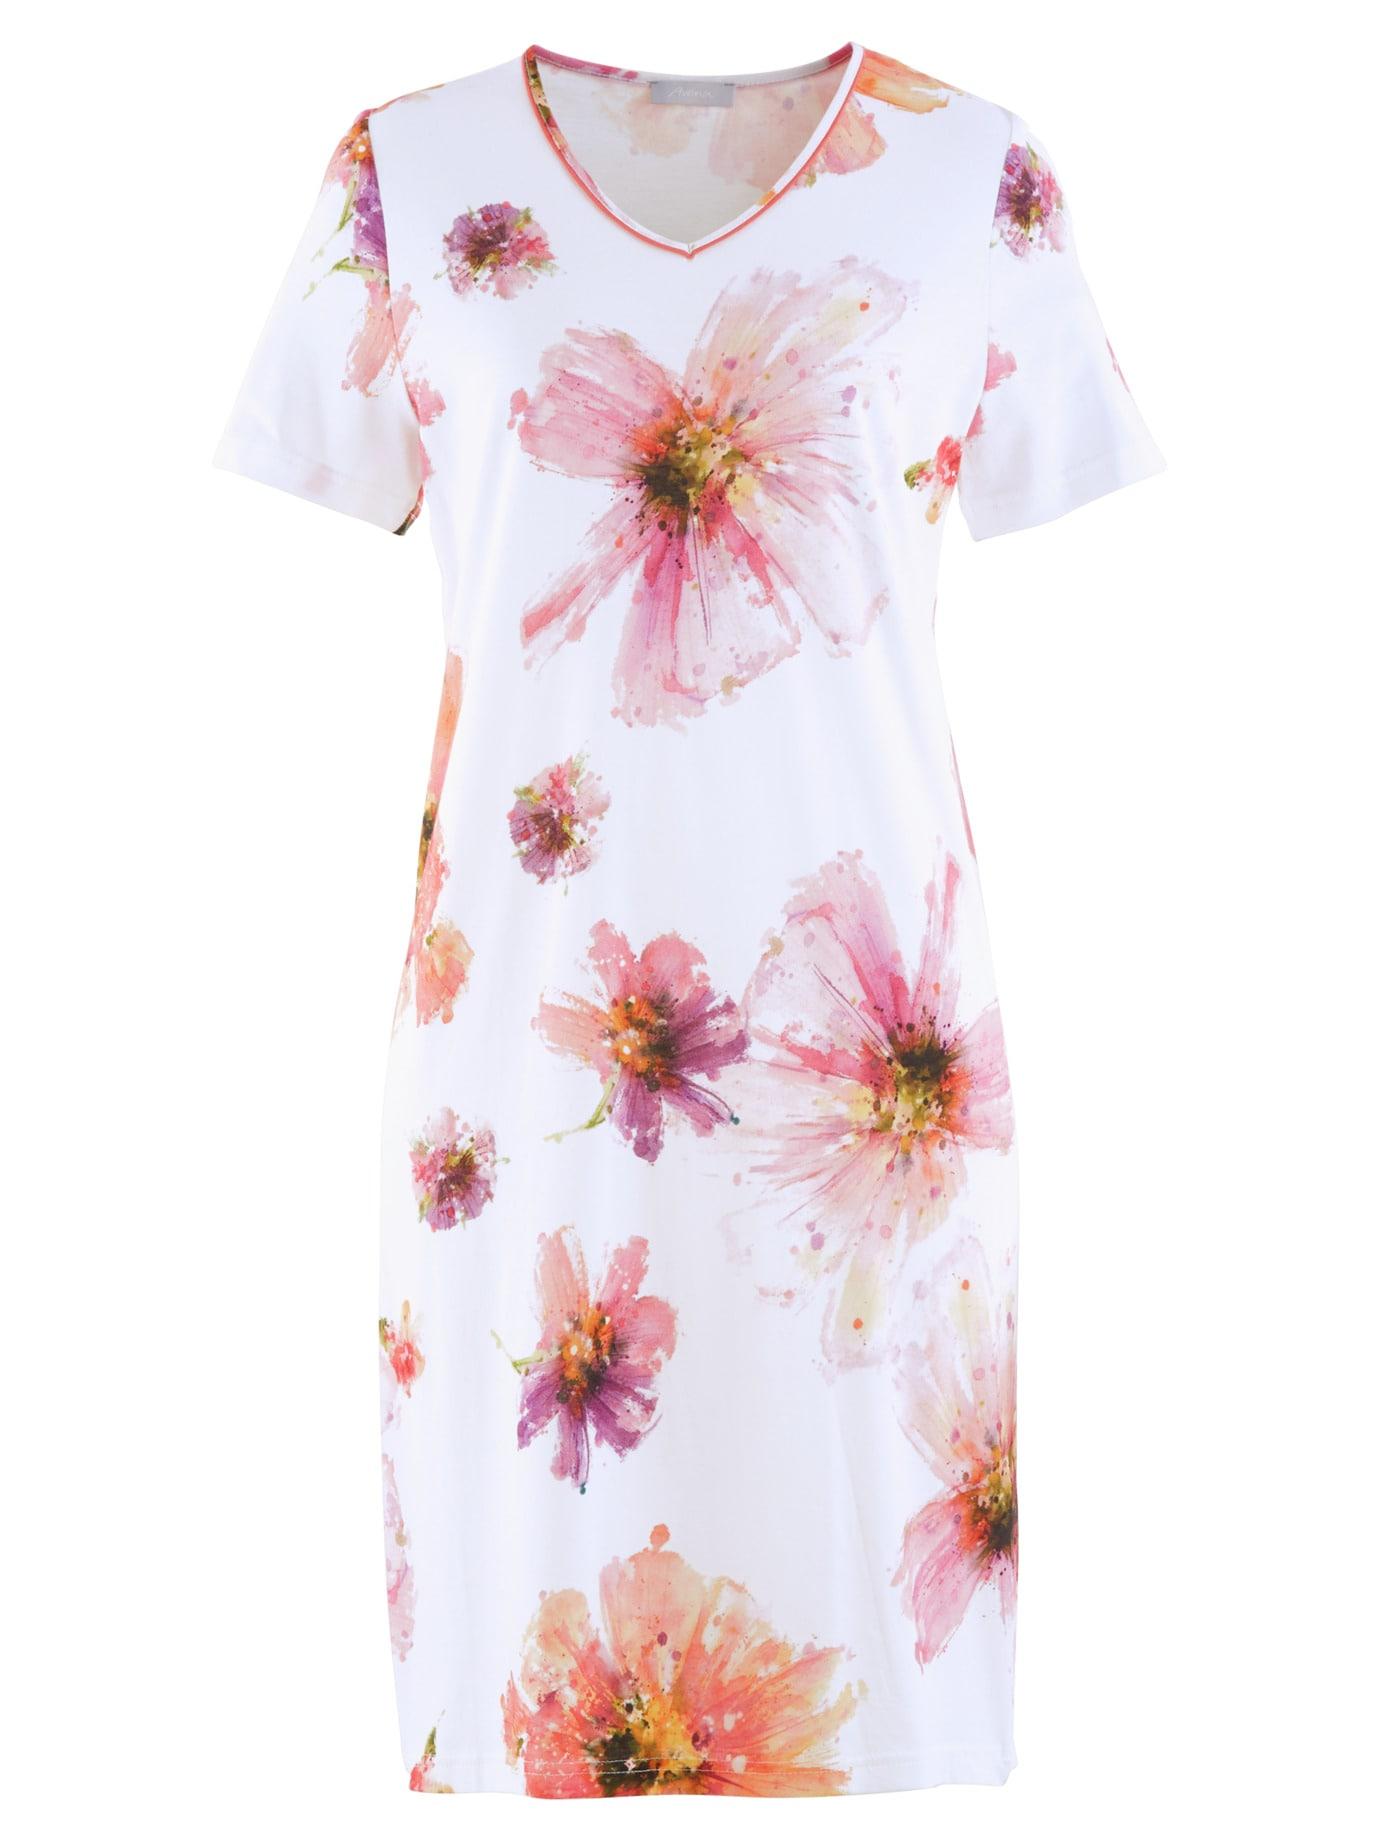 Avena Damen Nachthemd Sommerblüte Weiss 42-6380-3